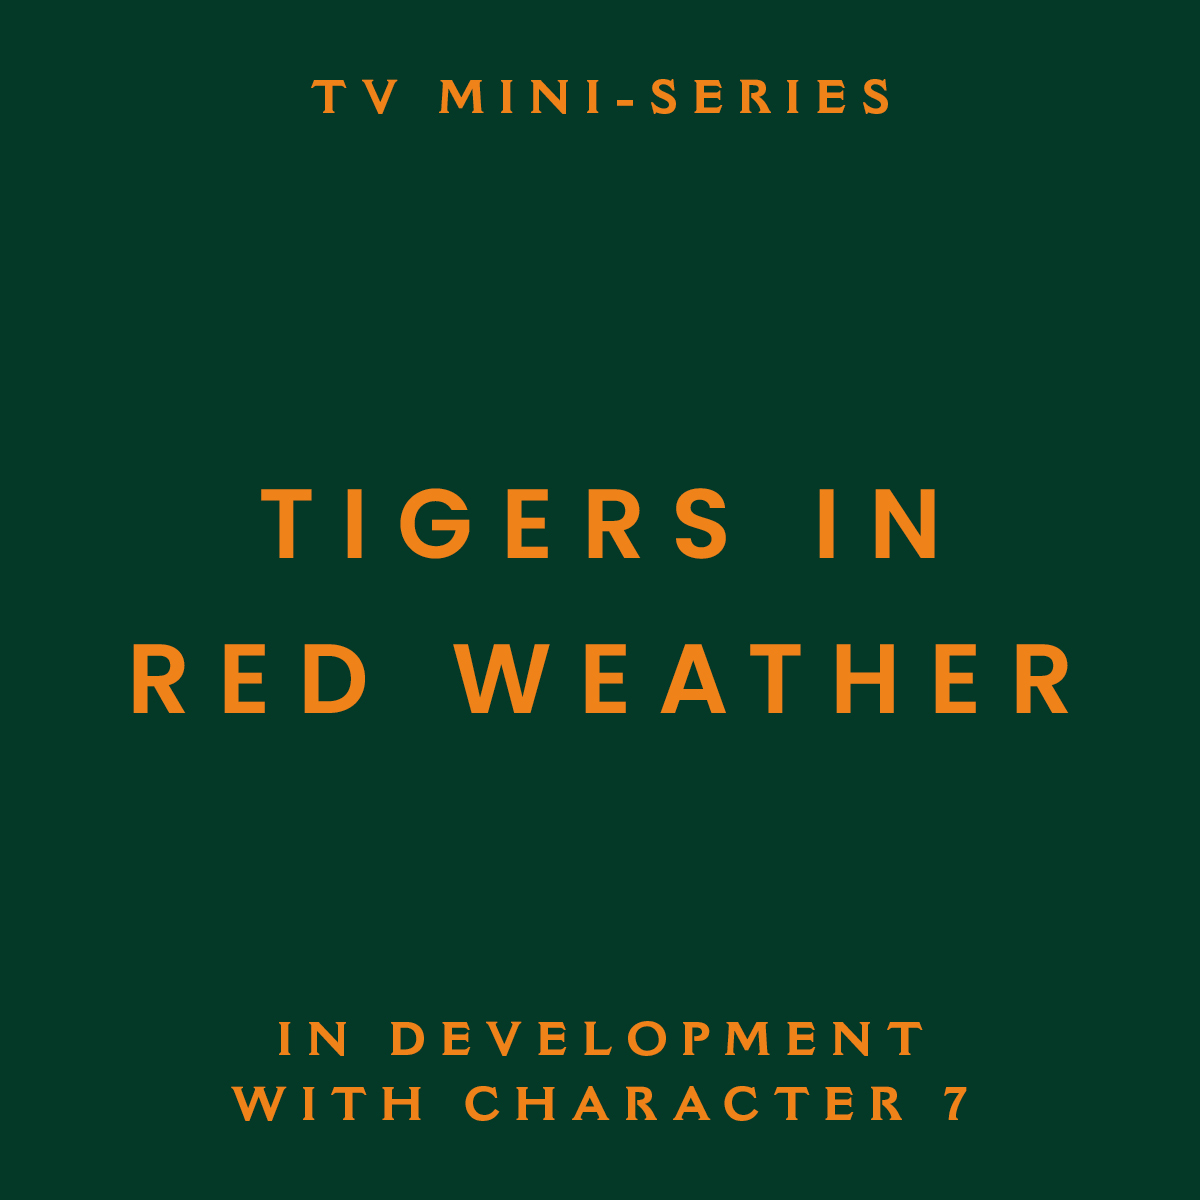 tigers in red weather, tv mini-series, in development, character 7, Stephen Garrett